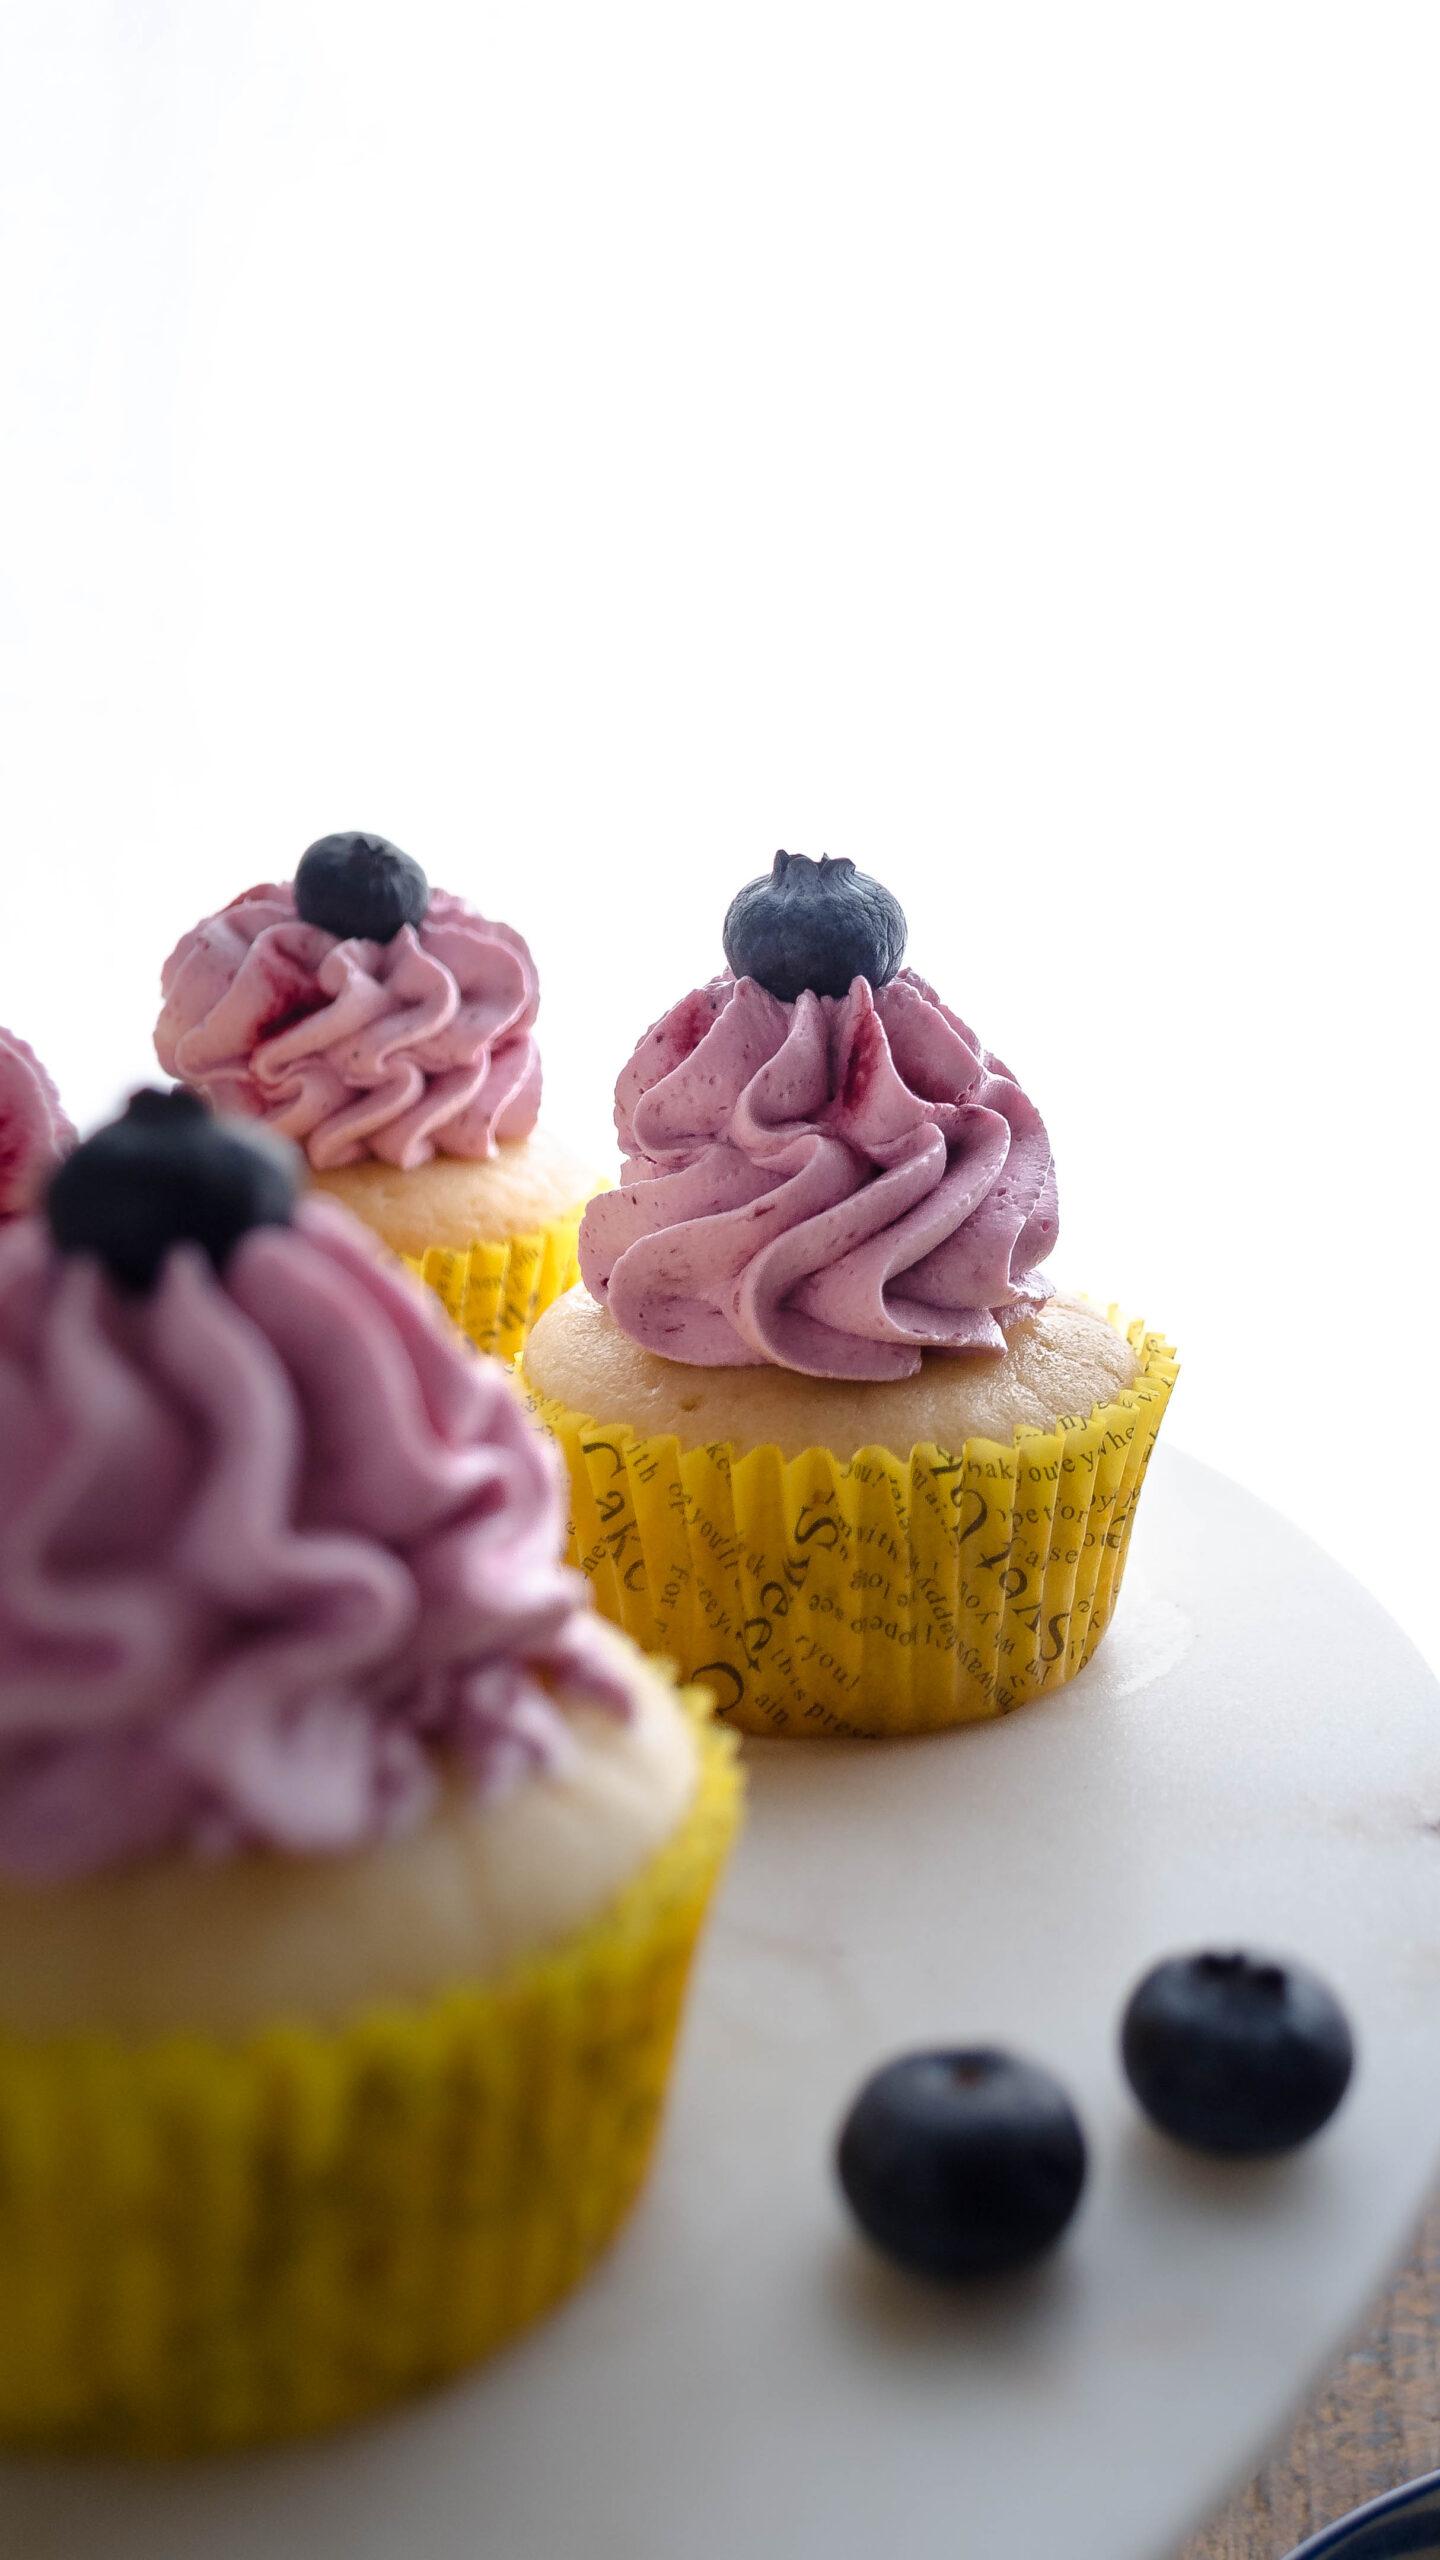 cupcake-8673